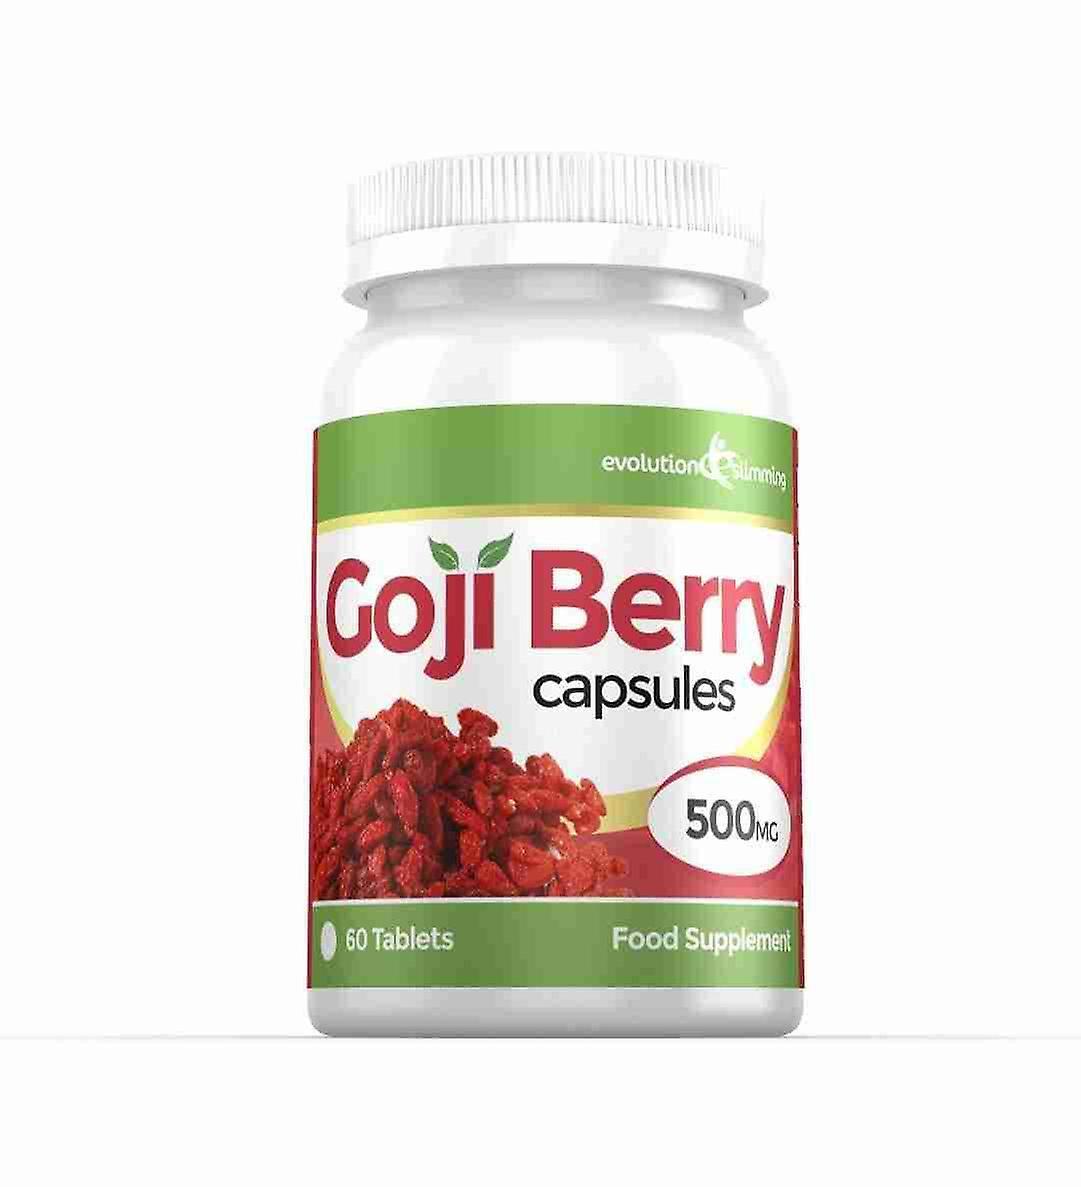 Goji Berry Extract 5,000mg High Strength Capsules - 60 Capsules - Antioxidant - Evolution Slimming